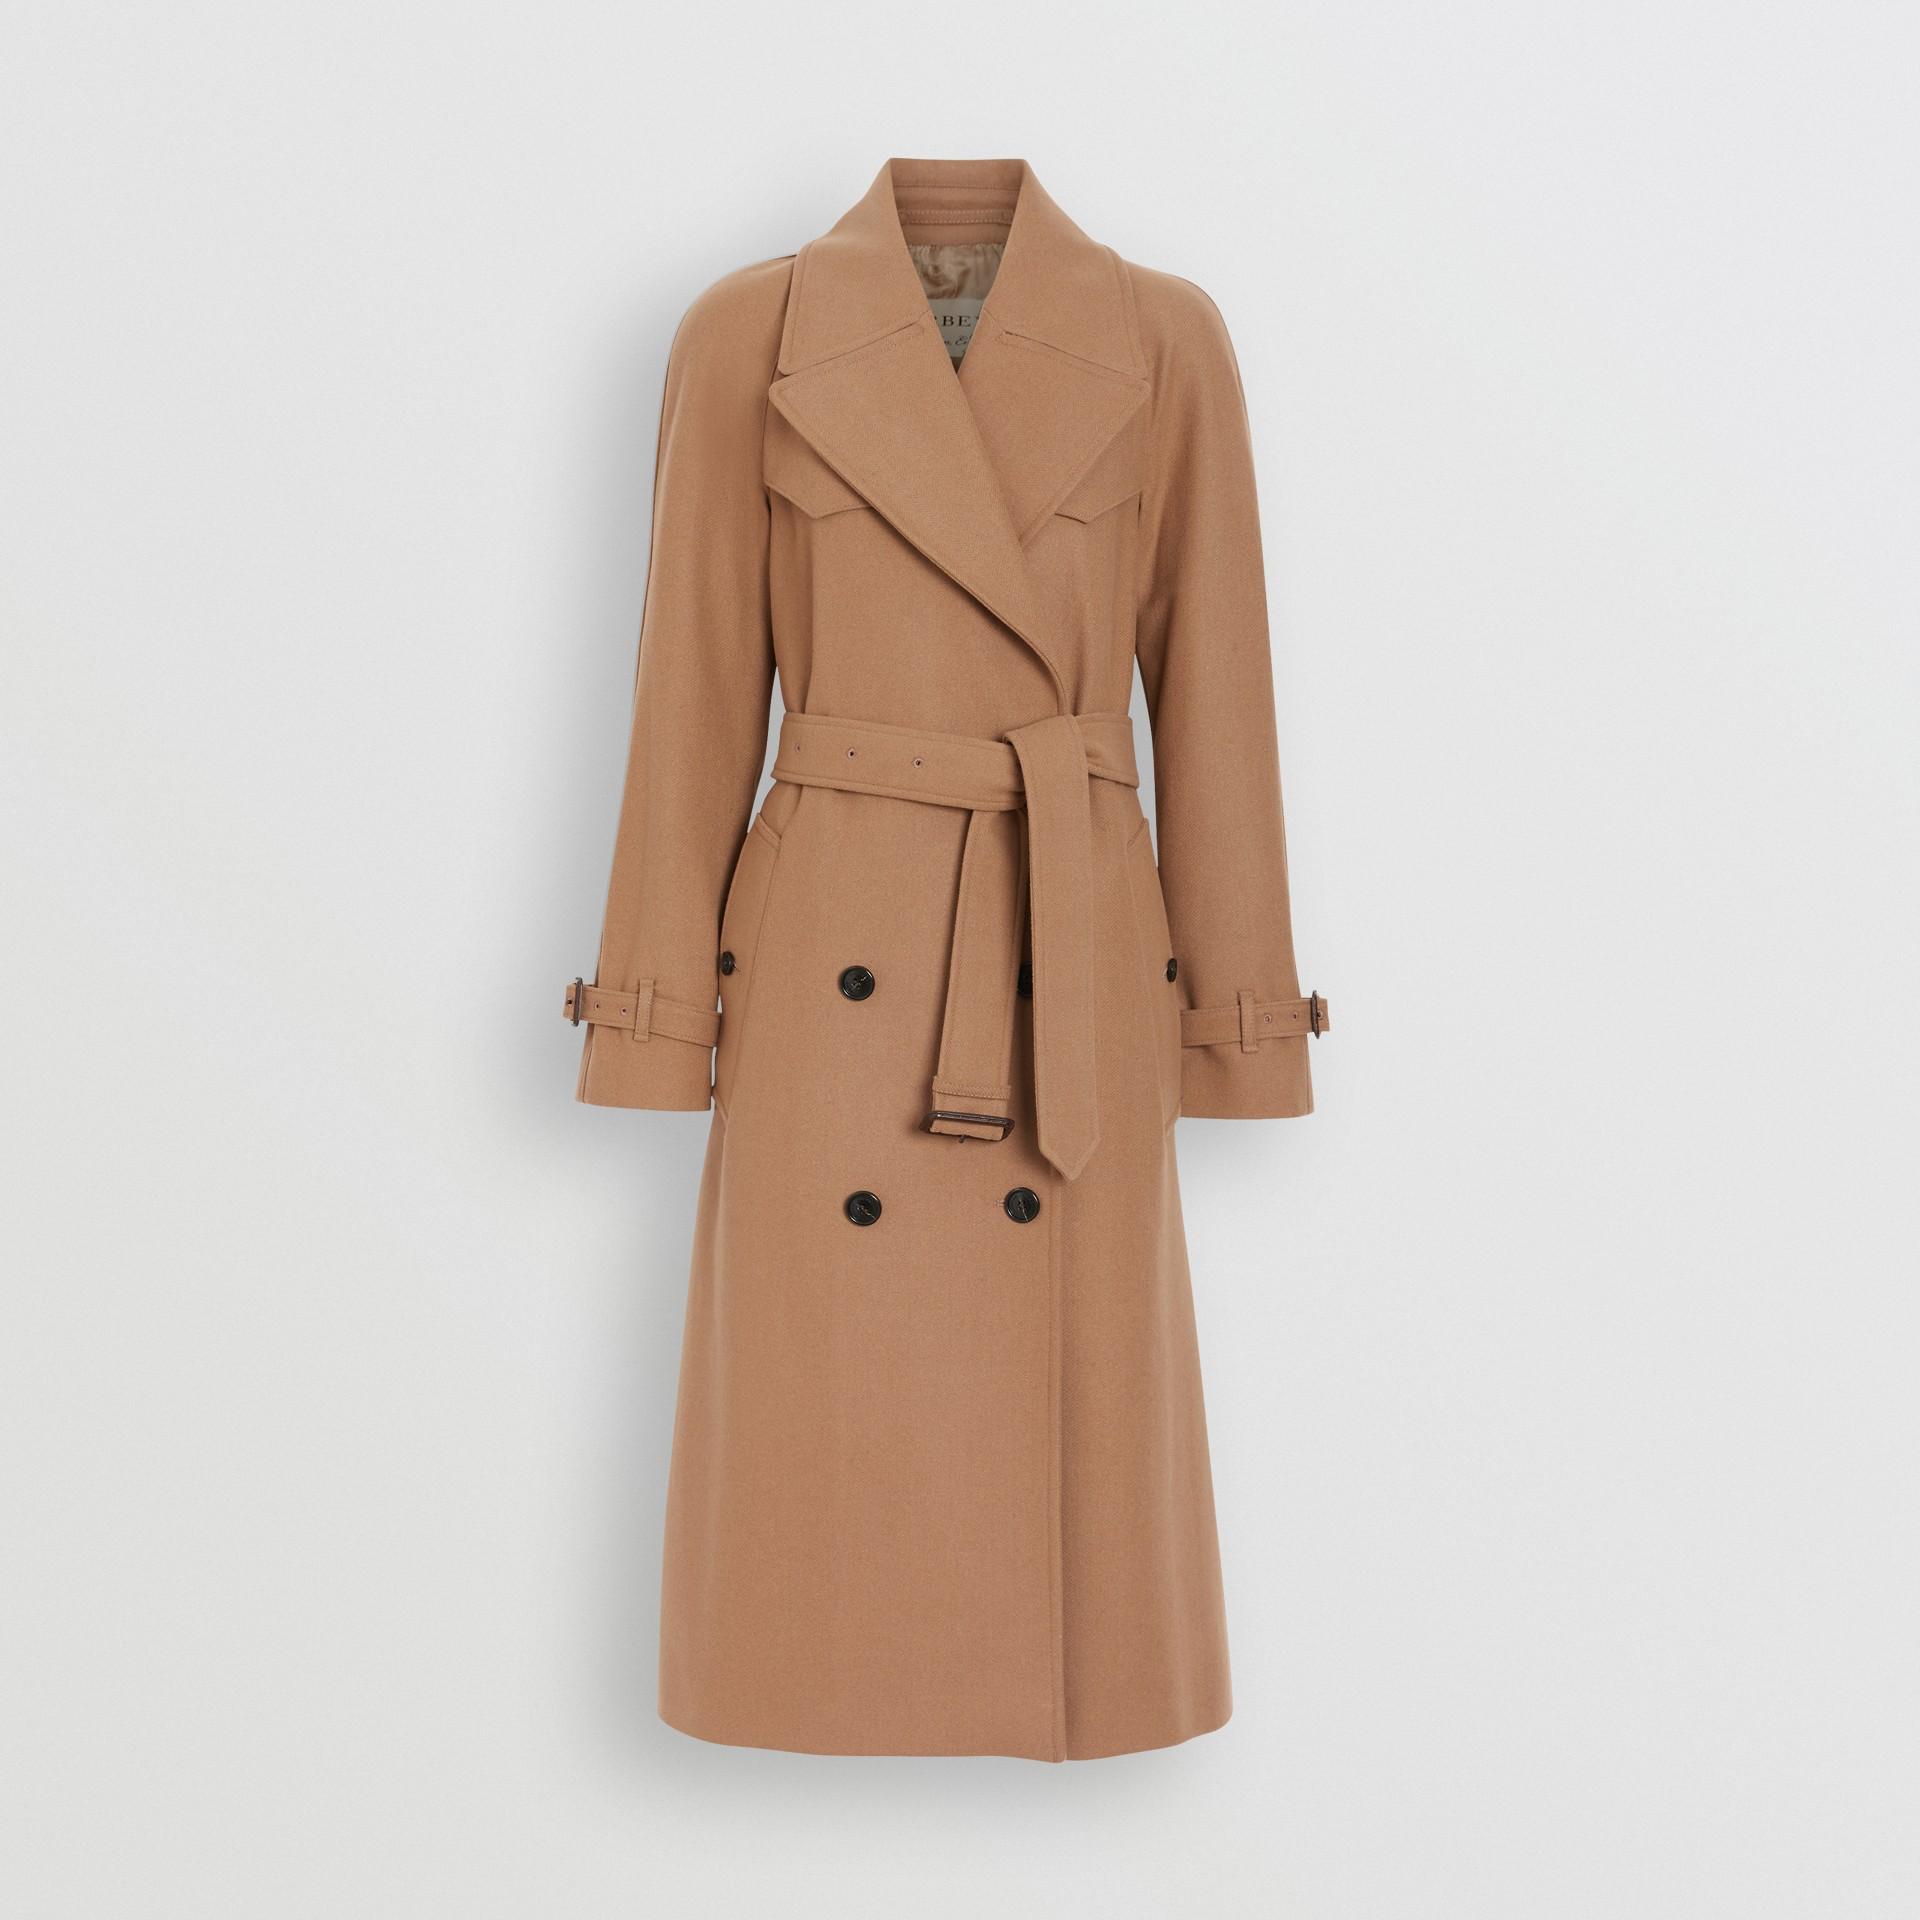 Herringbone Wool Cashmere Blend Trench Coat in Camel - Women | Burberry Australia - gallery image 3